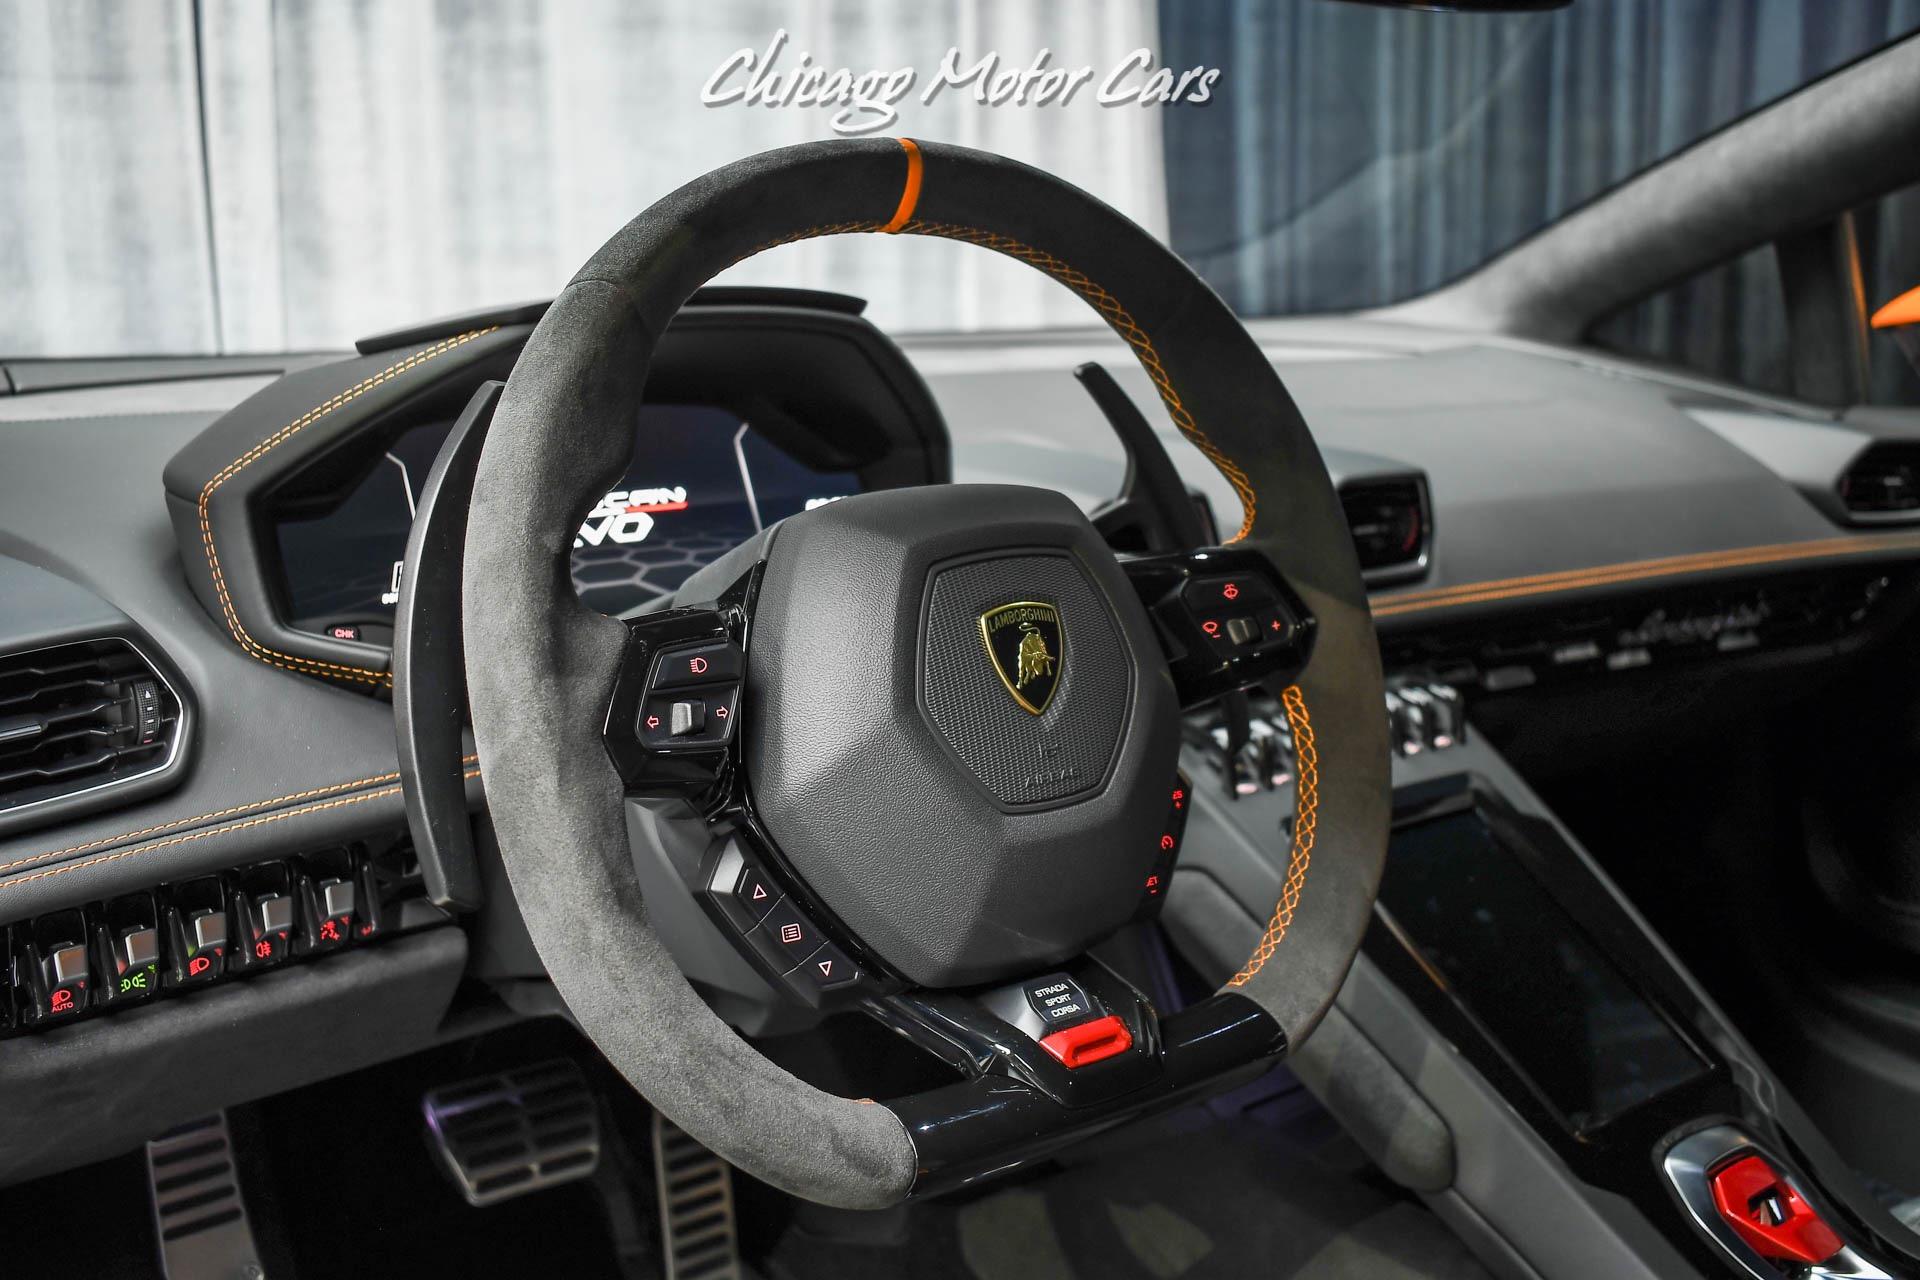 Used-2020-Lamborghini-Huracan-LP640-4-EVO-Celebrate-GT-AWD-Coupe-ULTRA-RARE-1-of-36-Only-400-Miles